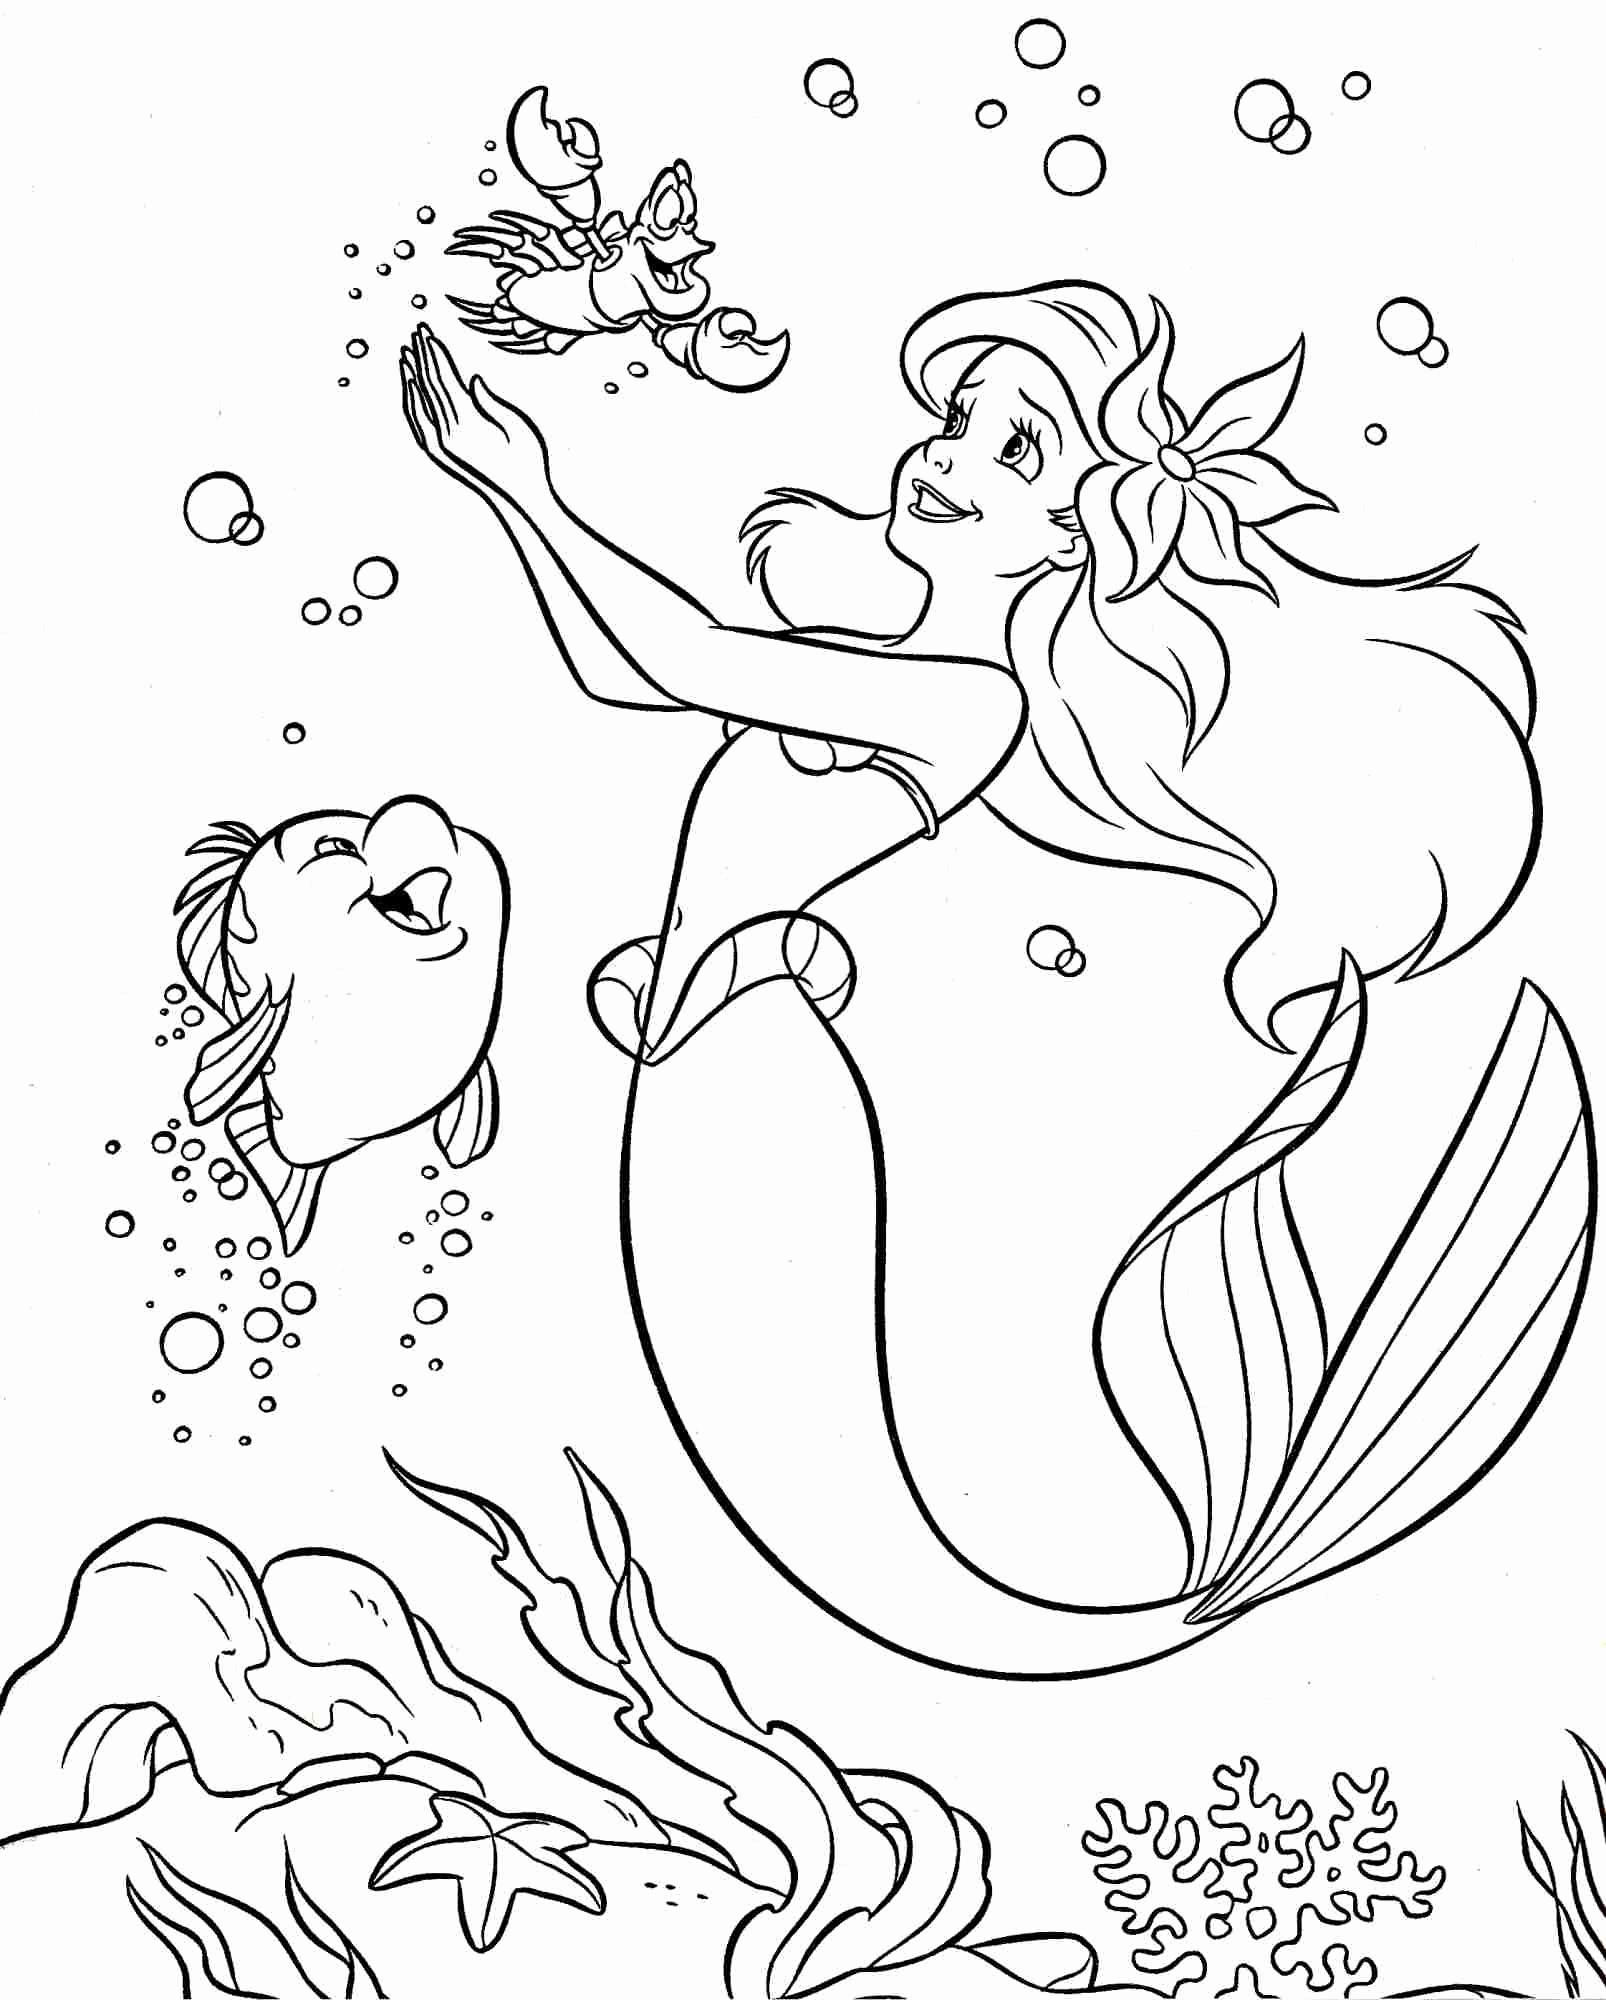 mermaid swimming drawing at getdrawings | free download